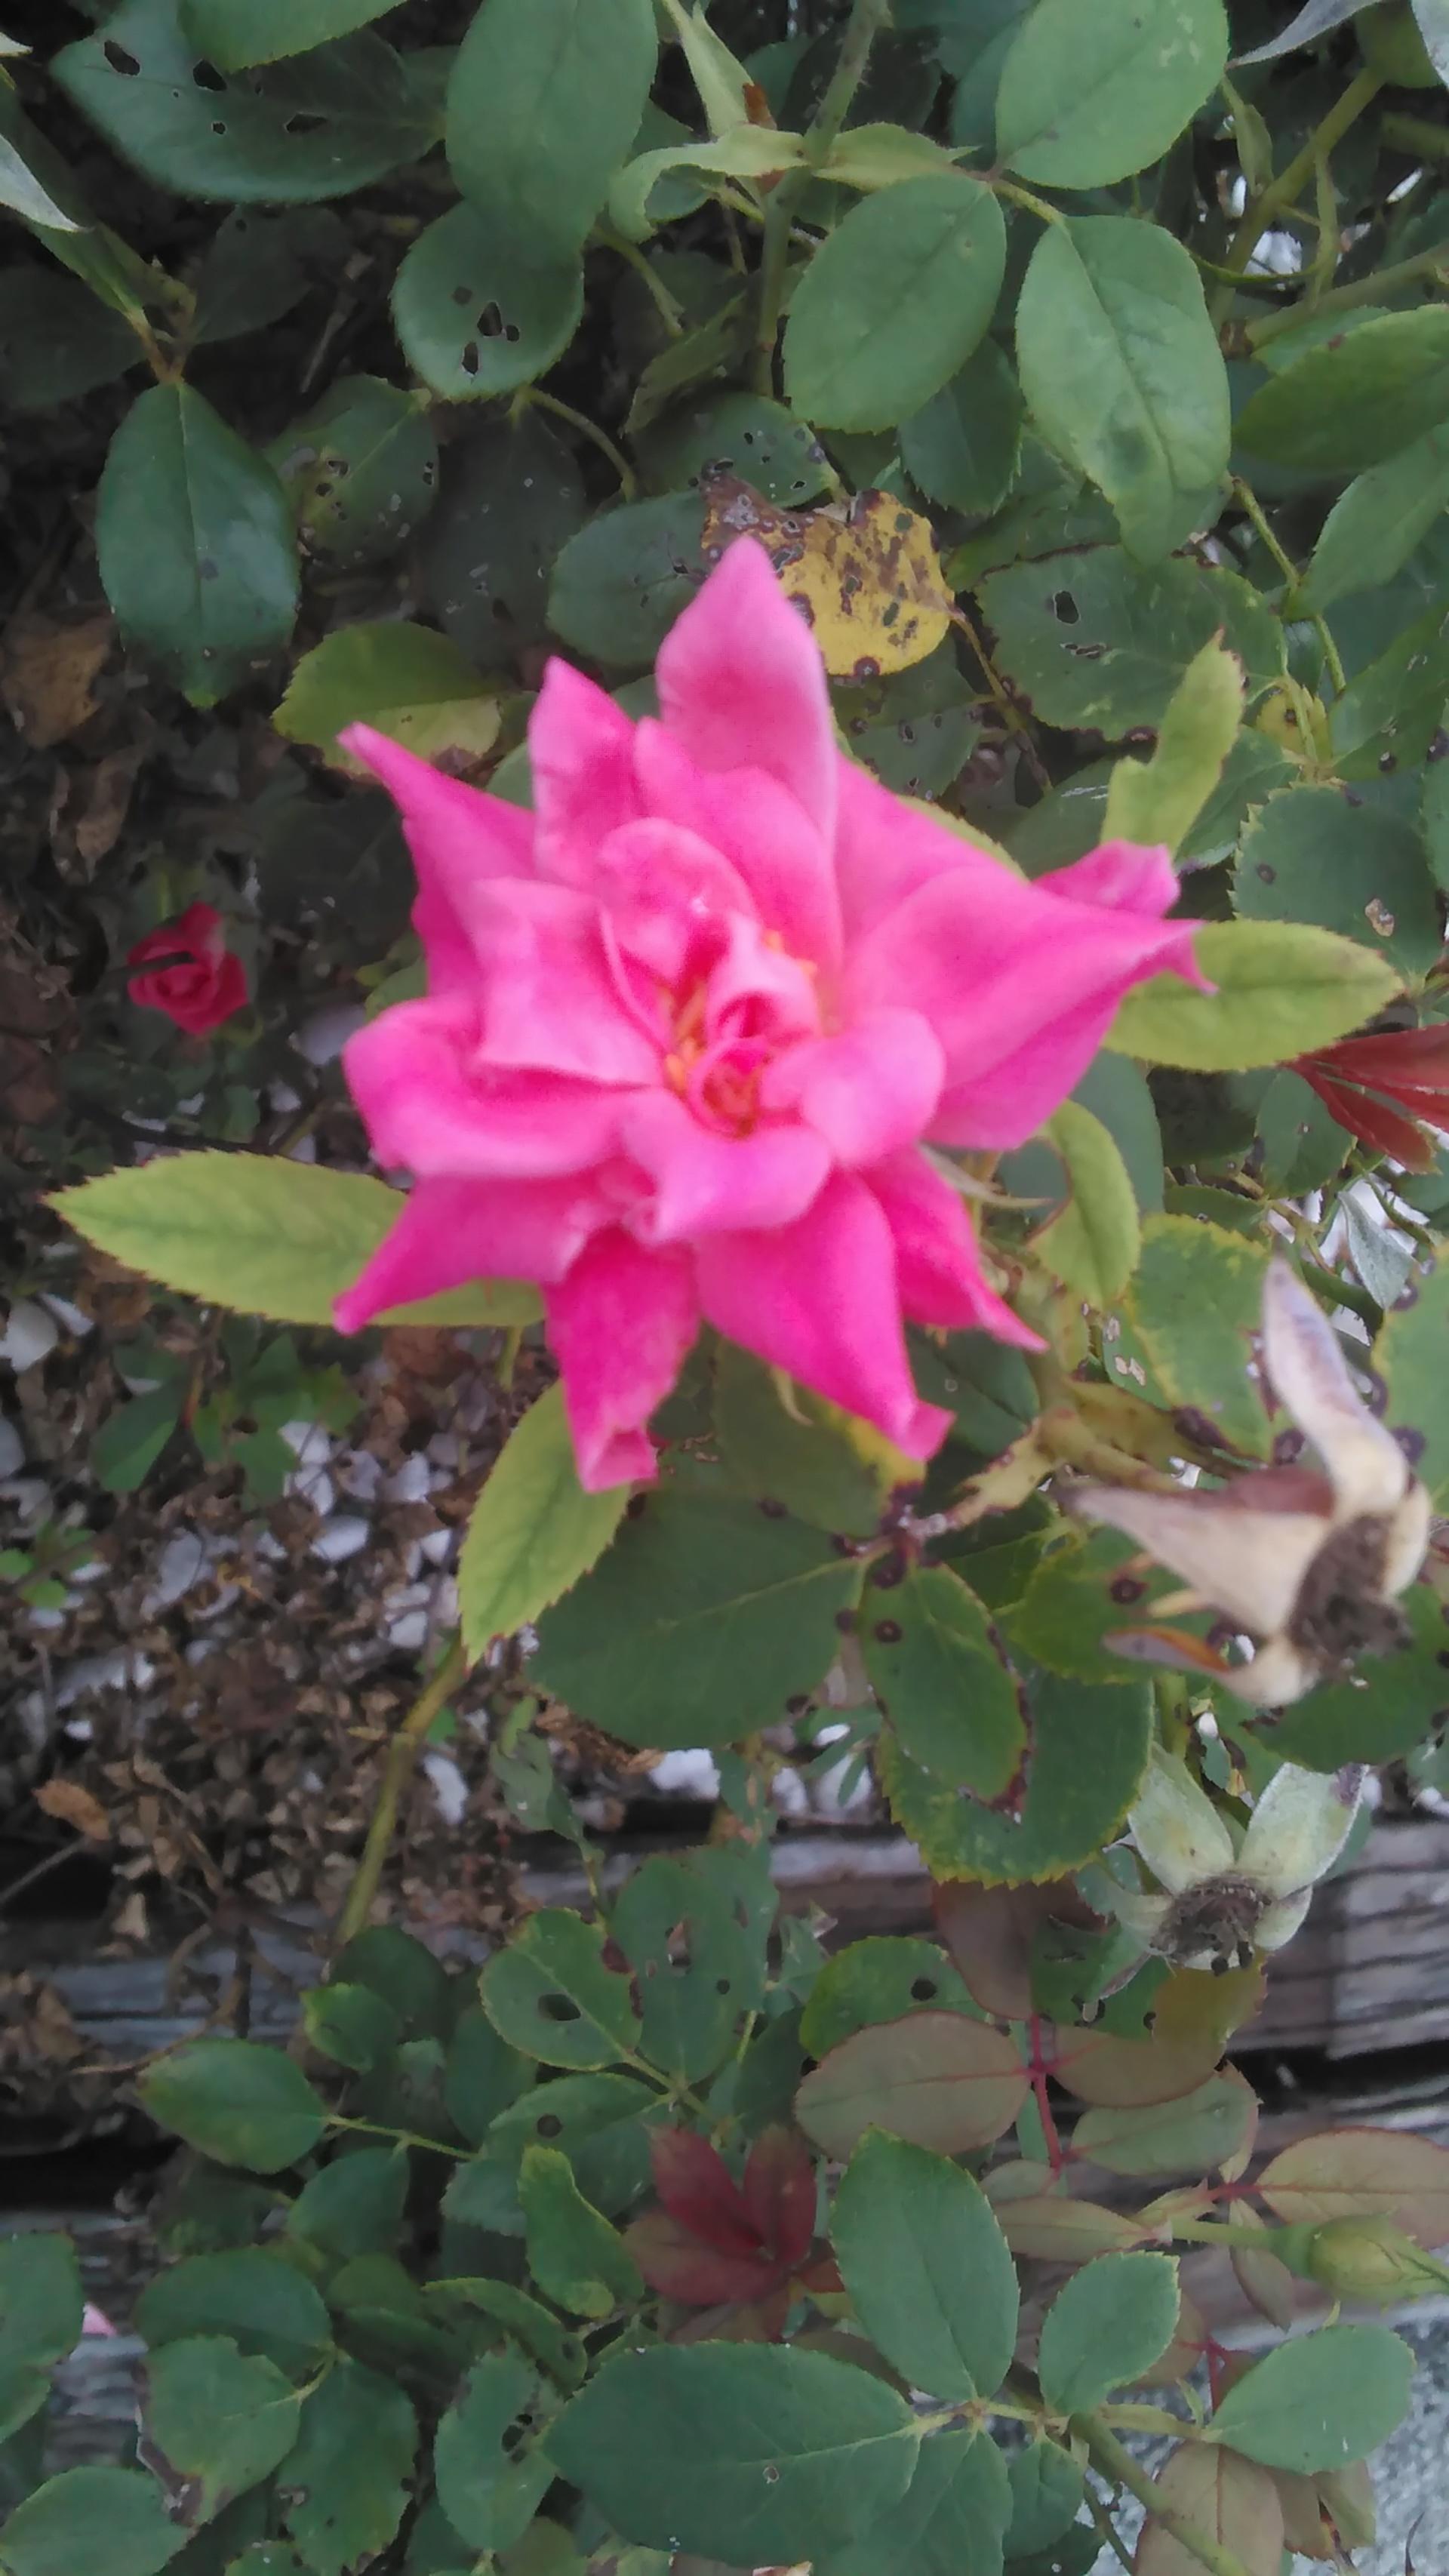 Little Rose | codenamesailorearth, bloom, botany, bush